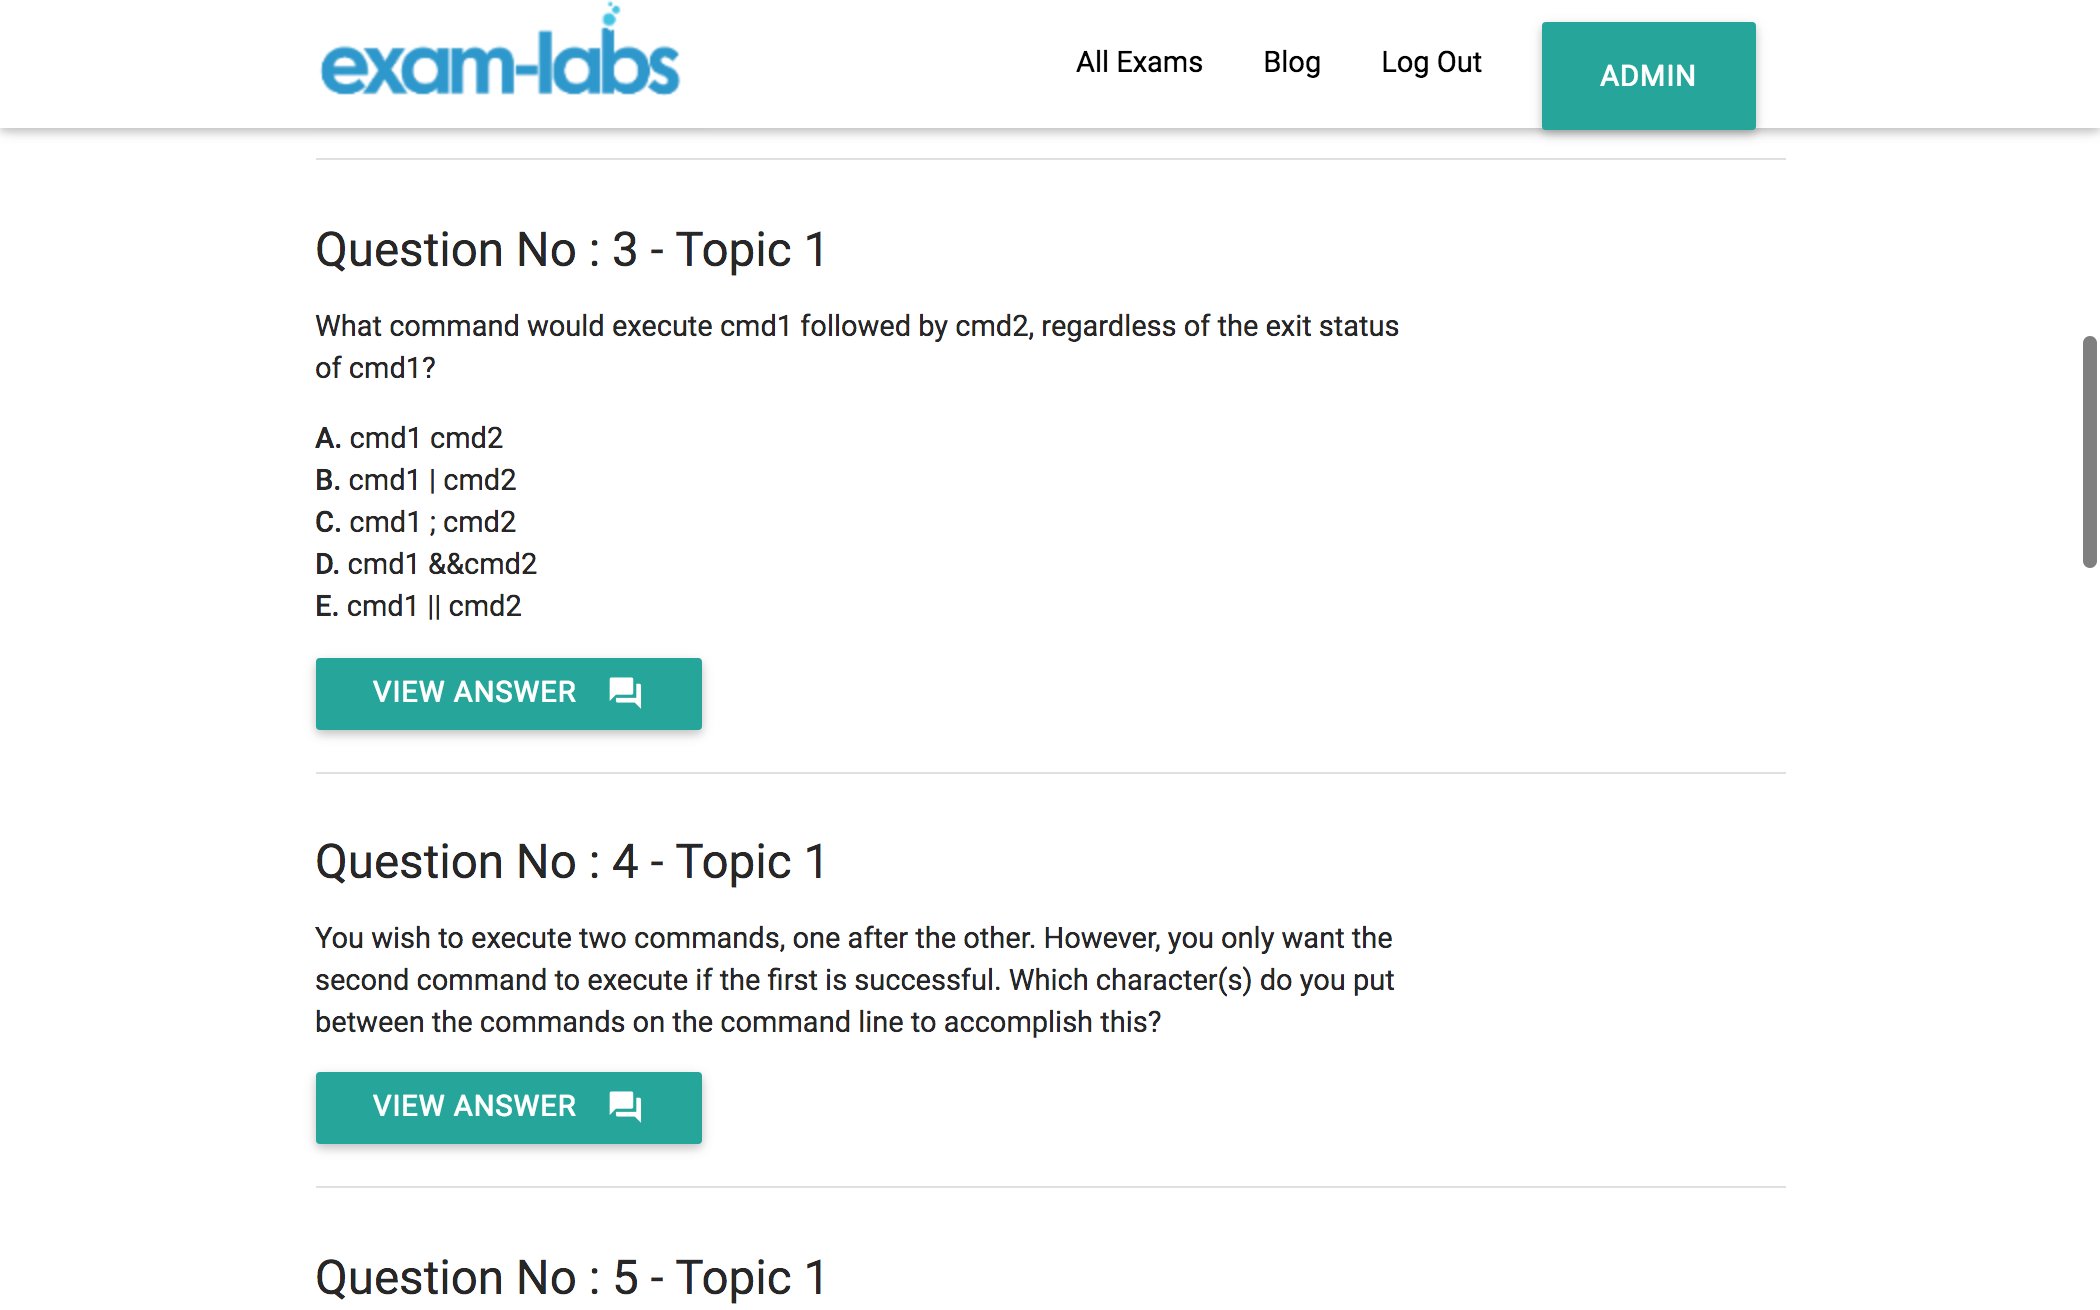 117 101 lpi practice exam questions 100 free exam labs rh exam labs com SHRM Exam Study Guide Exam Study Tips